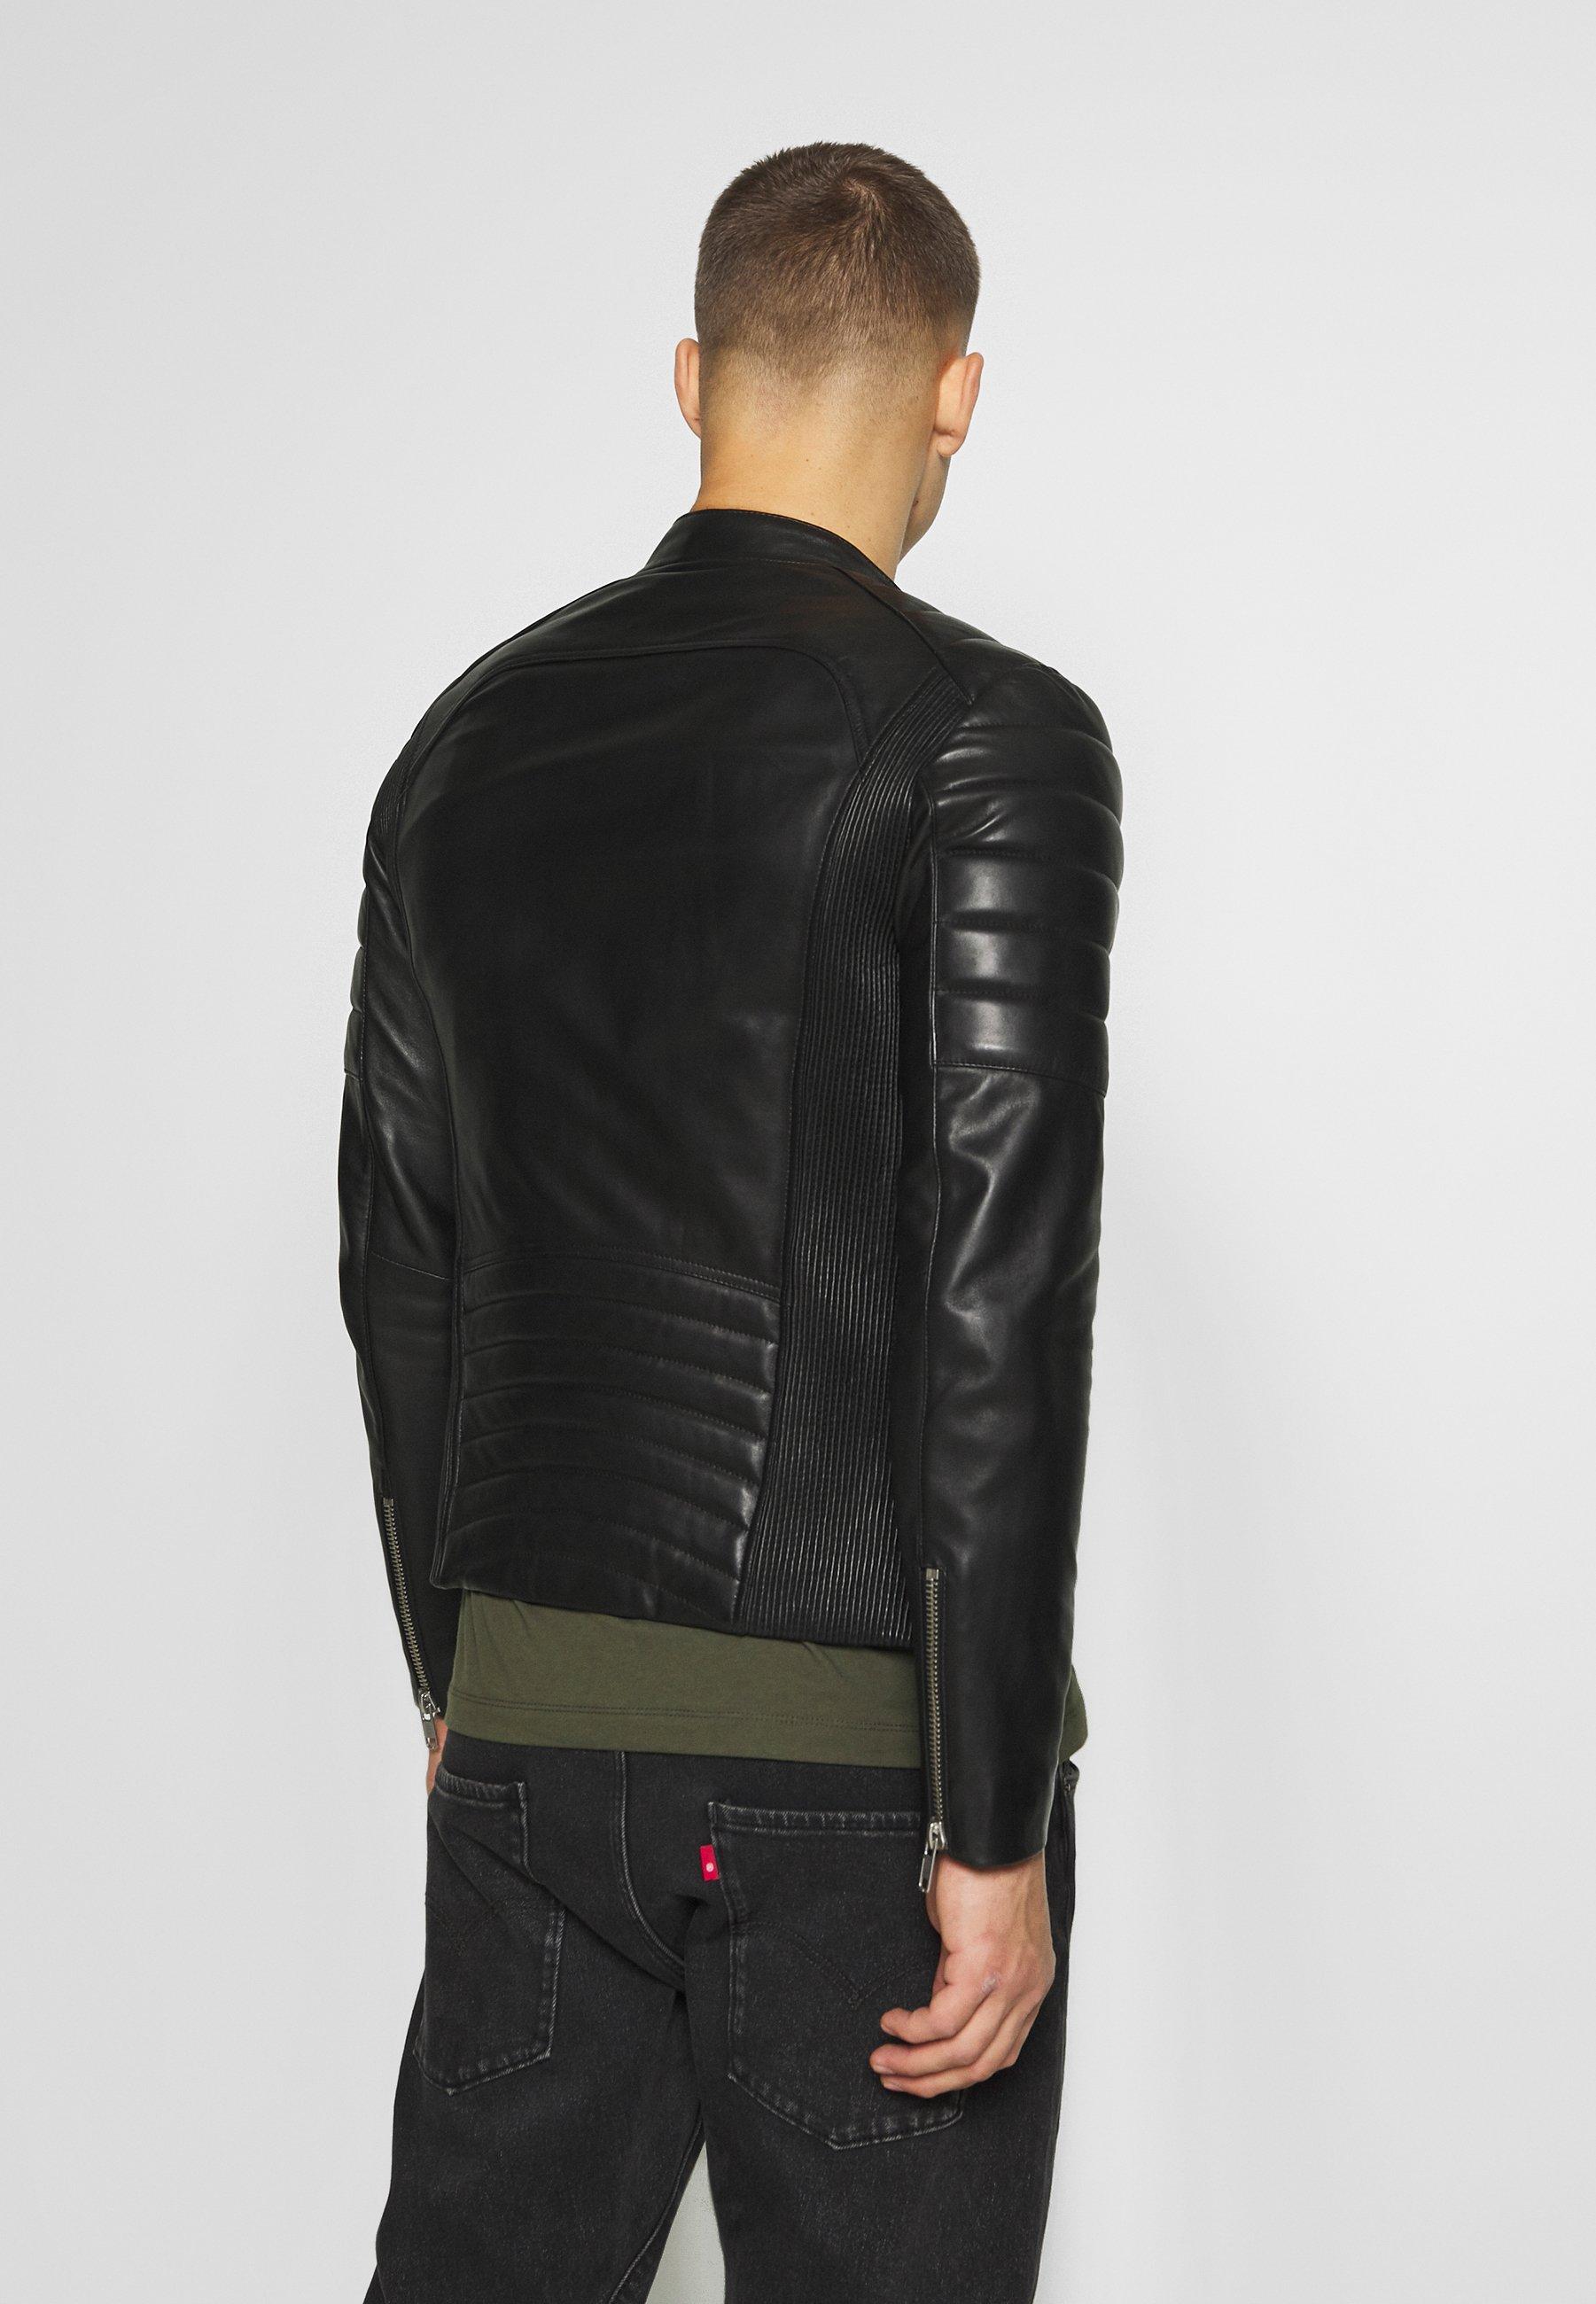 Big Sale Wholesale Serge Pariente GLADIATOR - Leather jacket - black   men's clothing 2020 M7ZOO